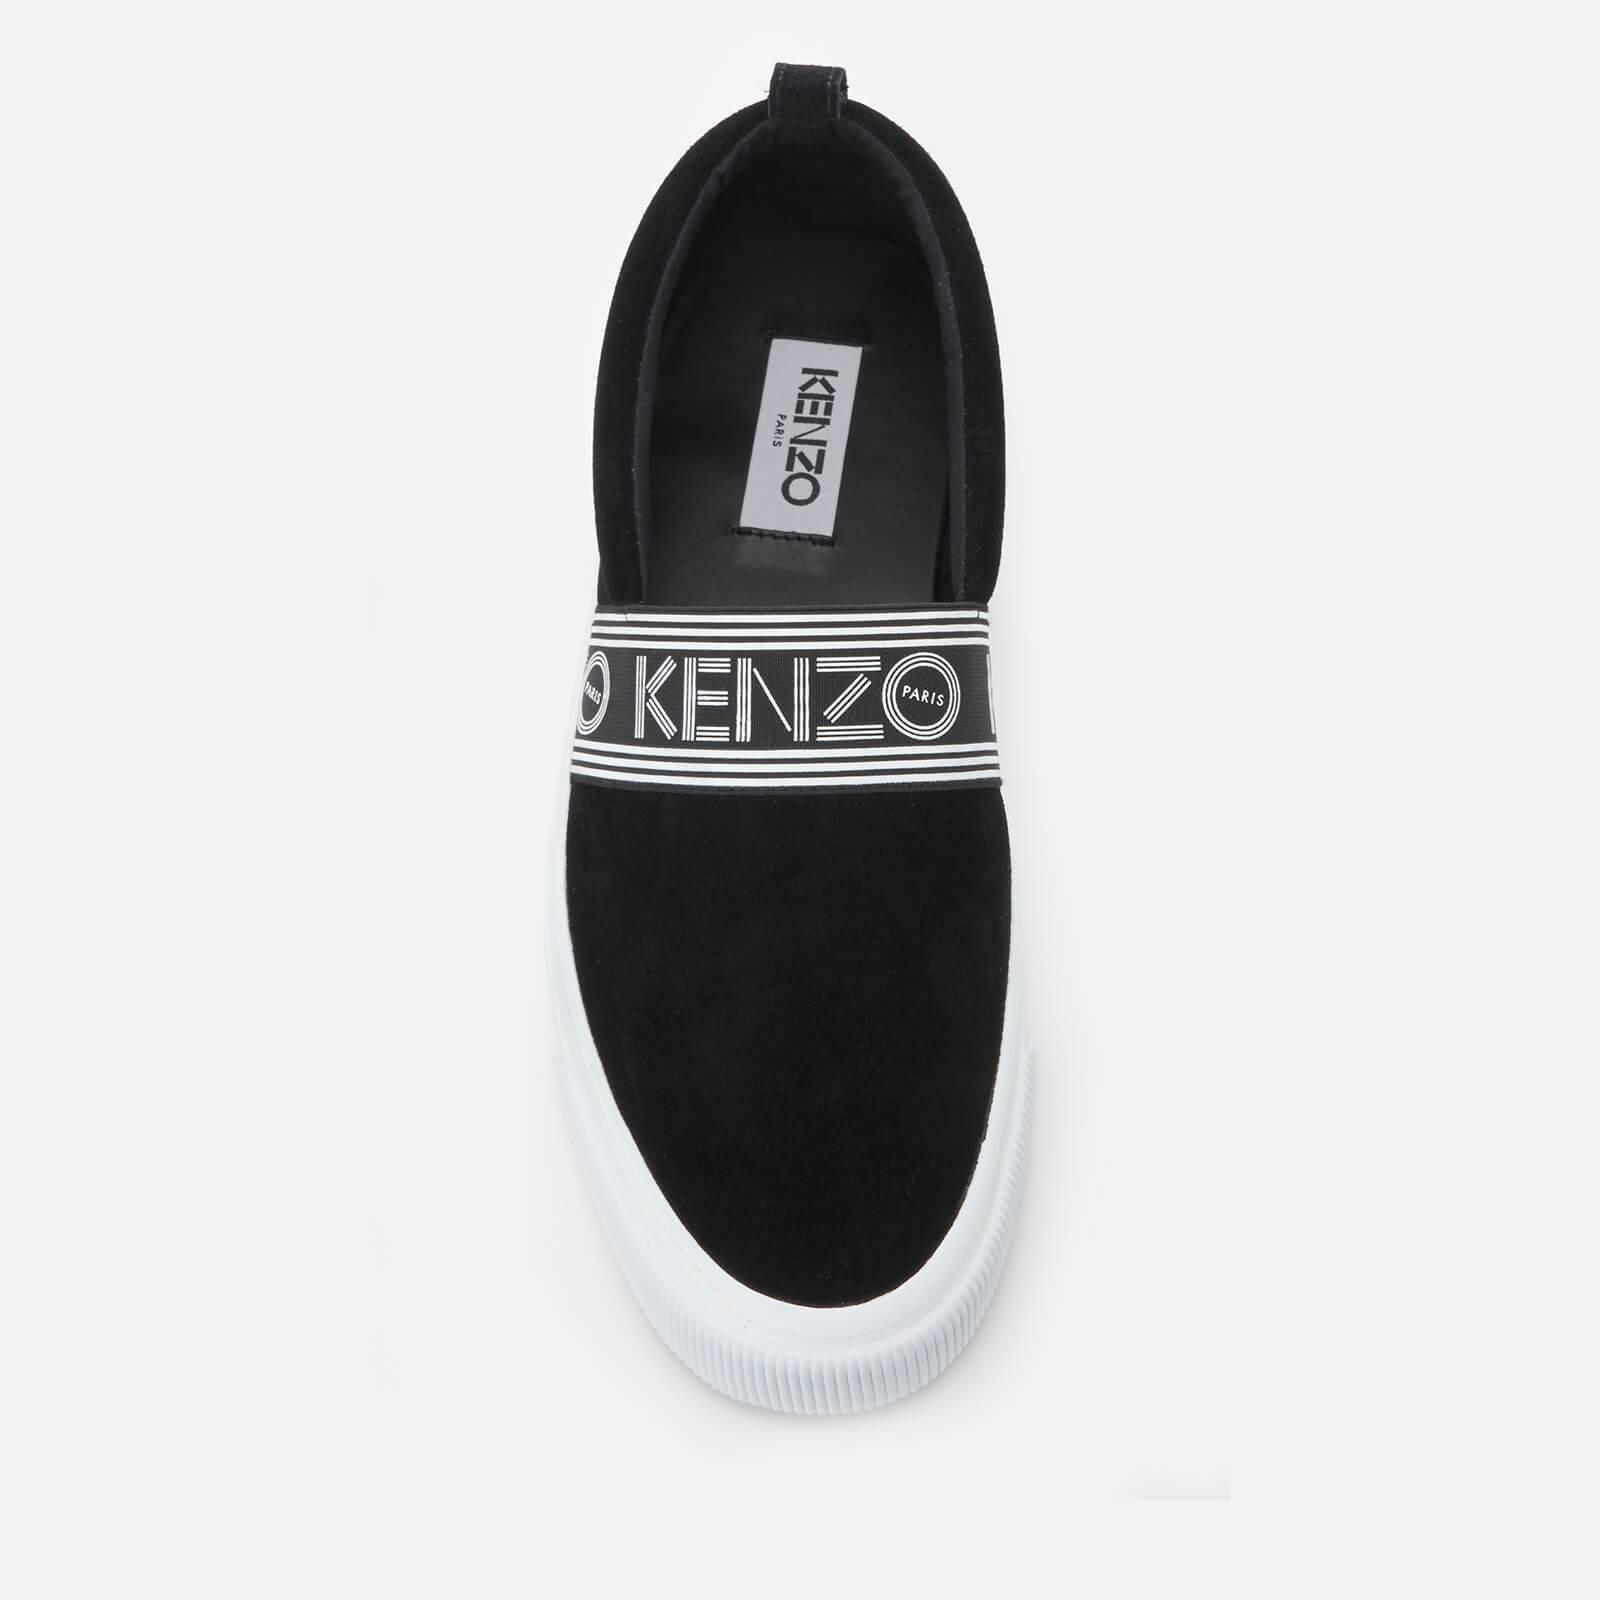 6d0b4238 KENZO Black Suede Kapri Slip-on Sneakers in Black for Men - Save 50 ...